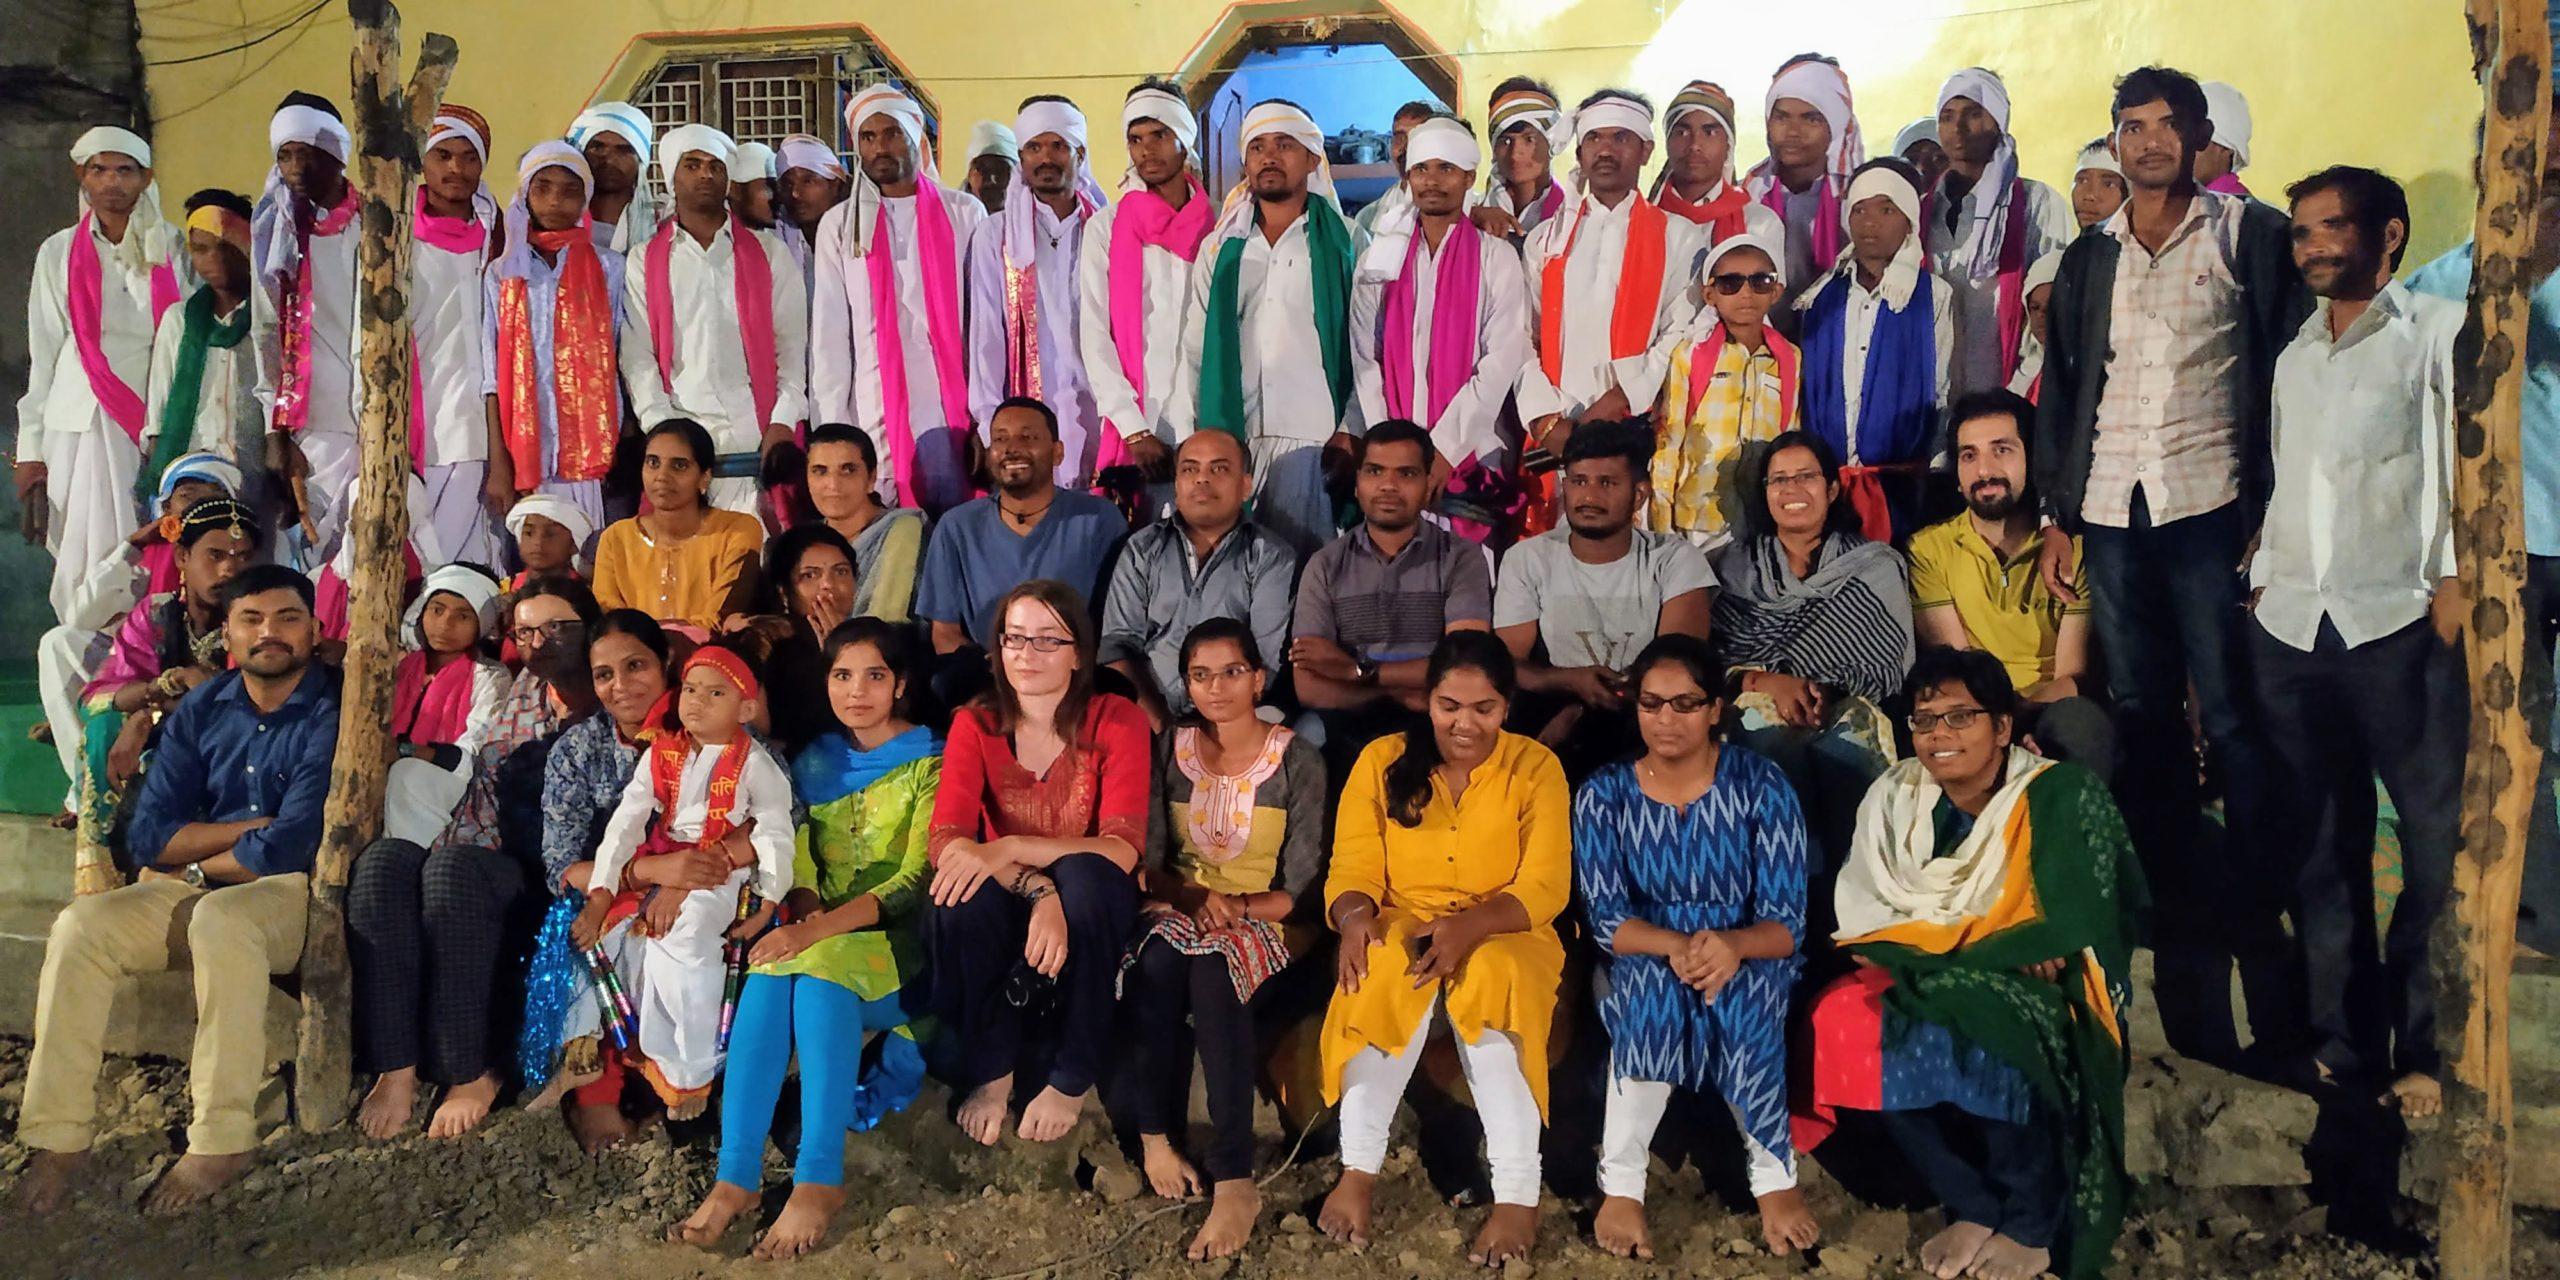 group-pic-adhilabad-scaled